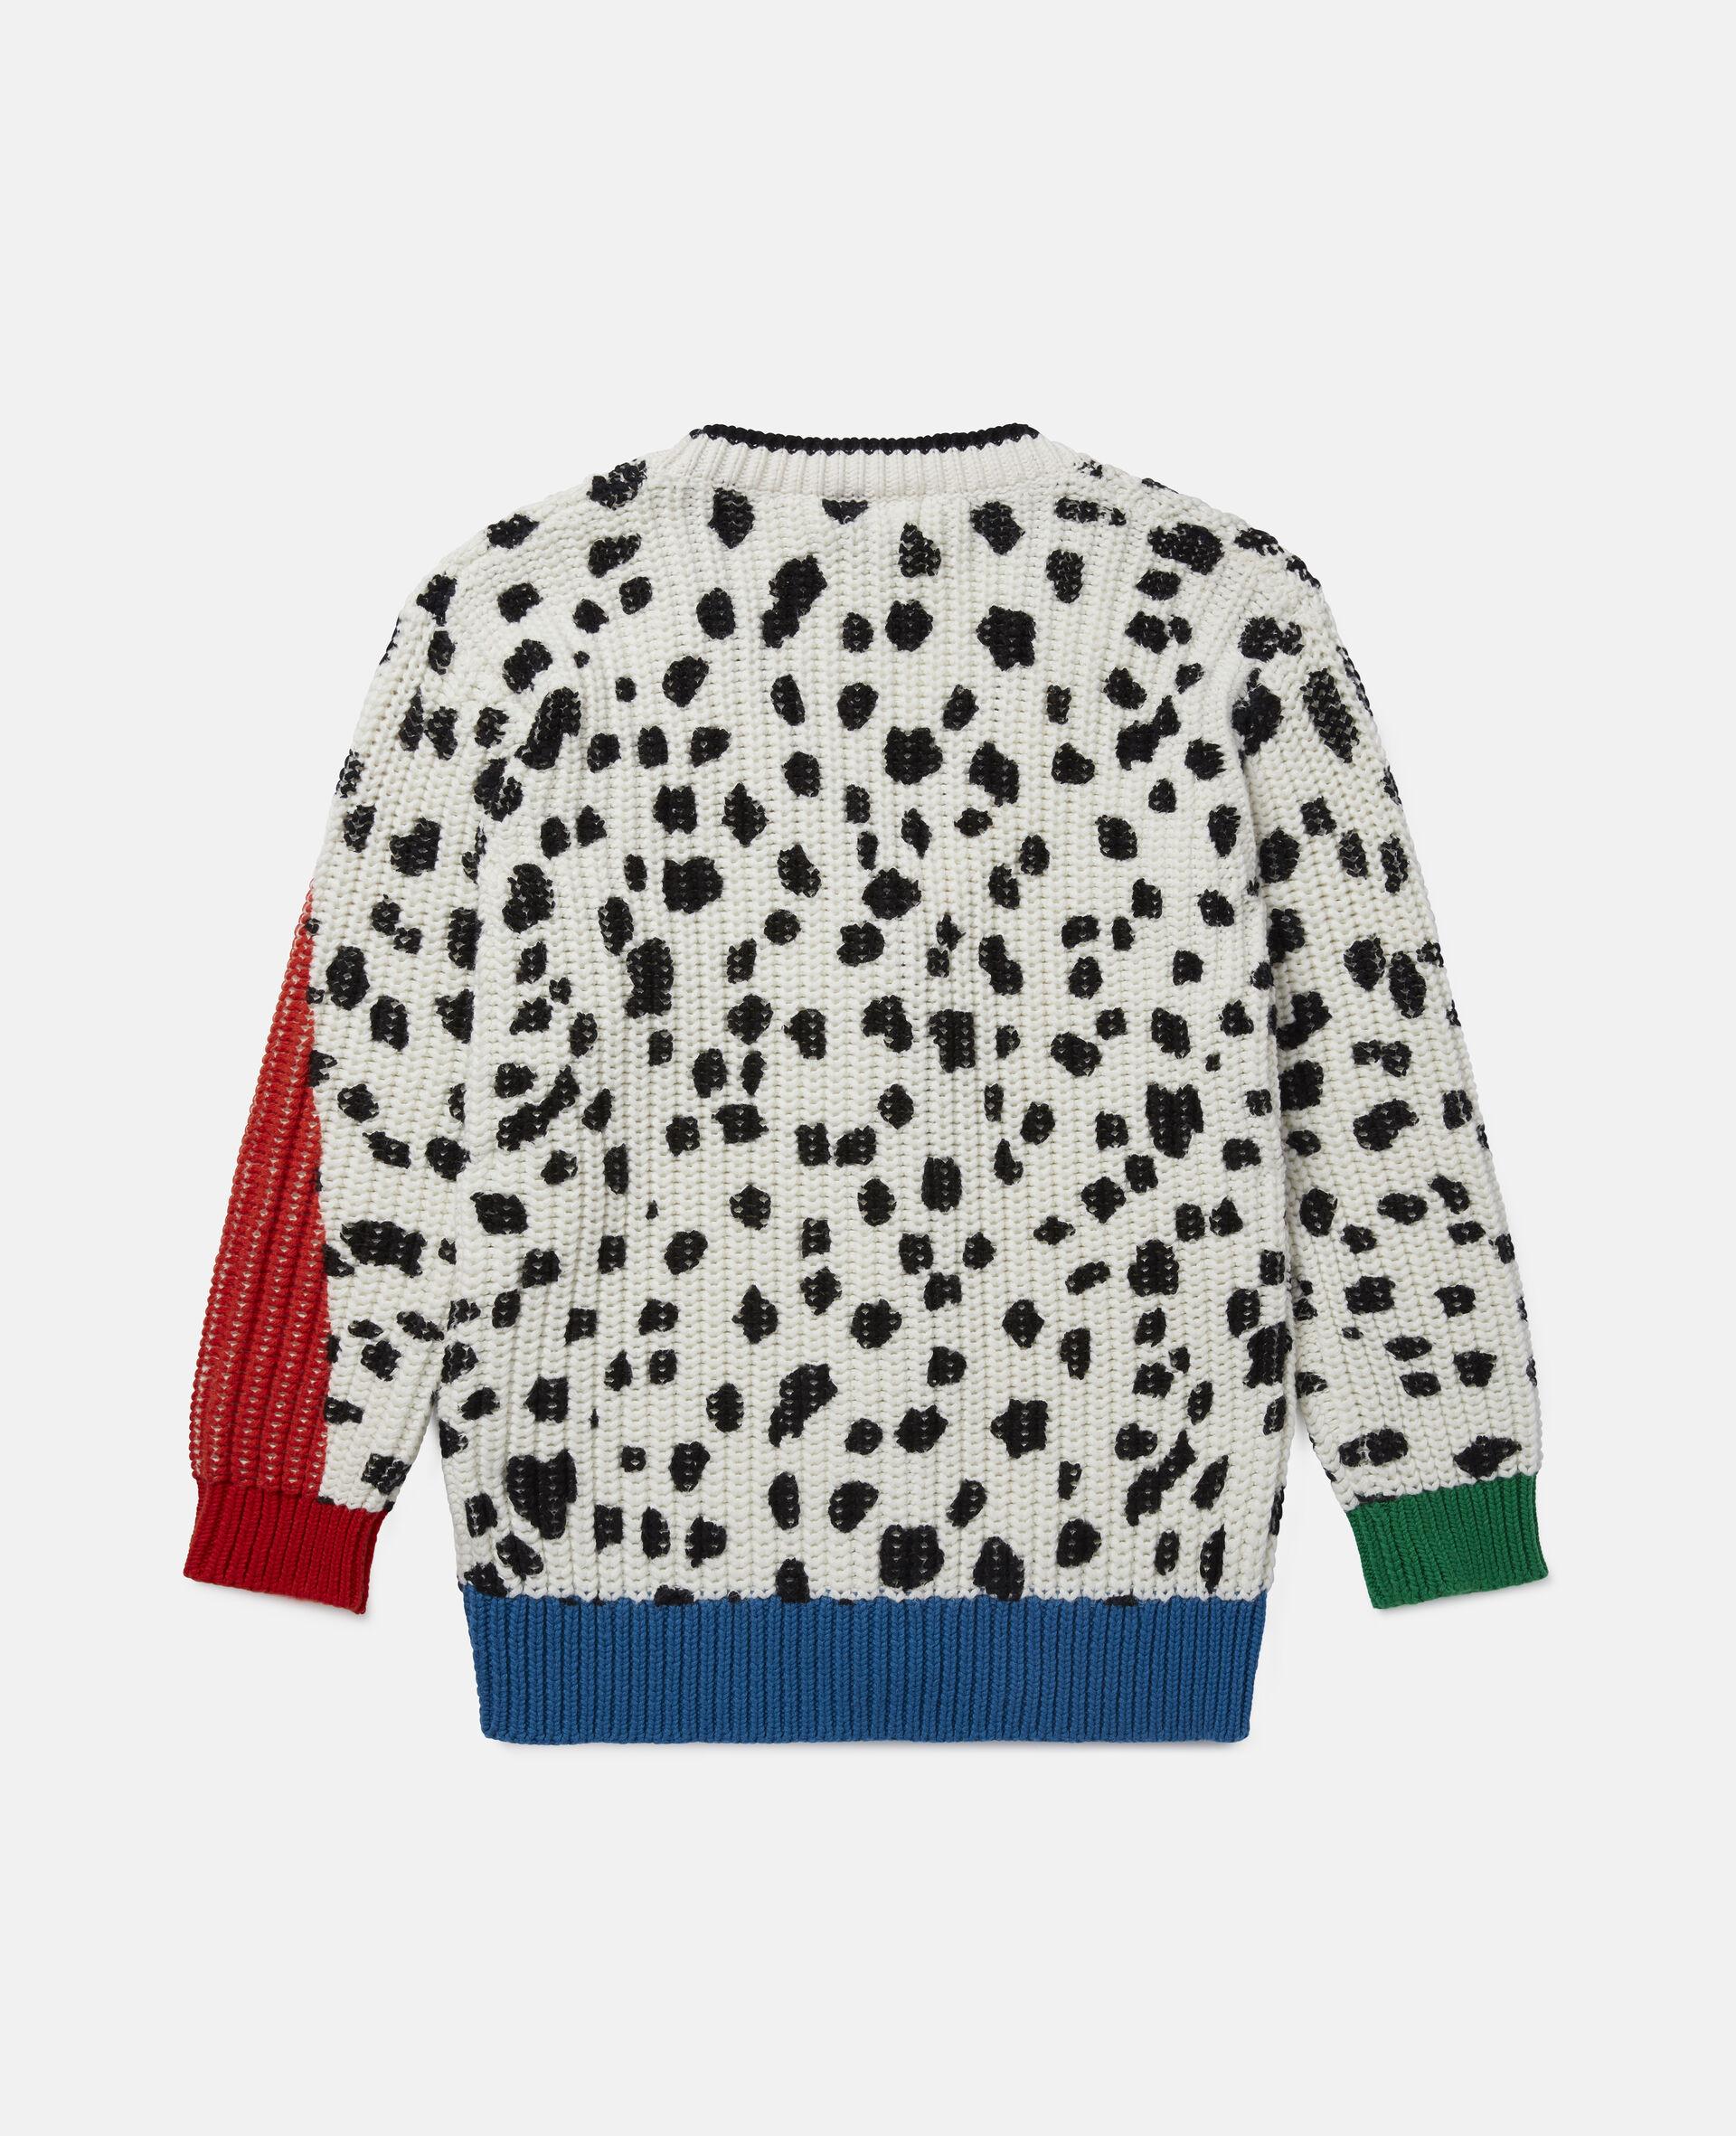 Dalmatian Spots Knit Cardigan -Multicolour-large image number 3